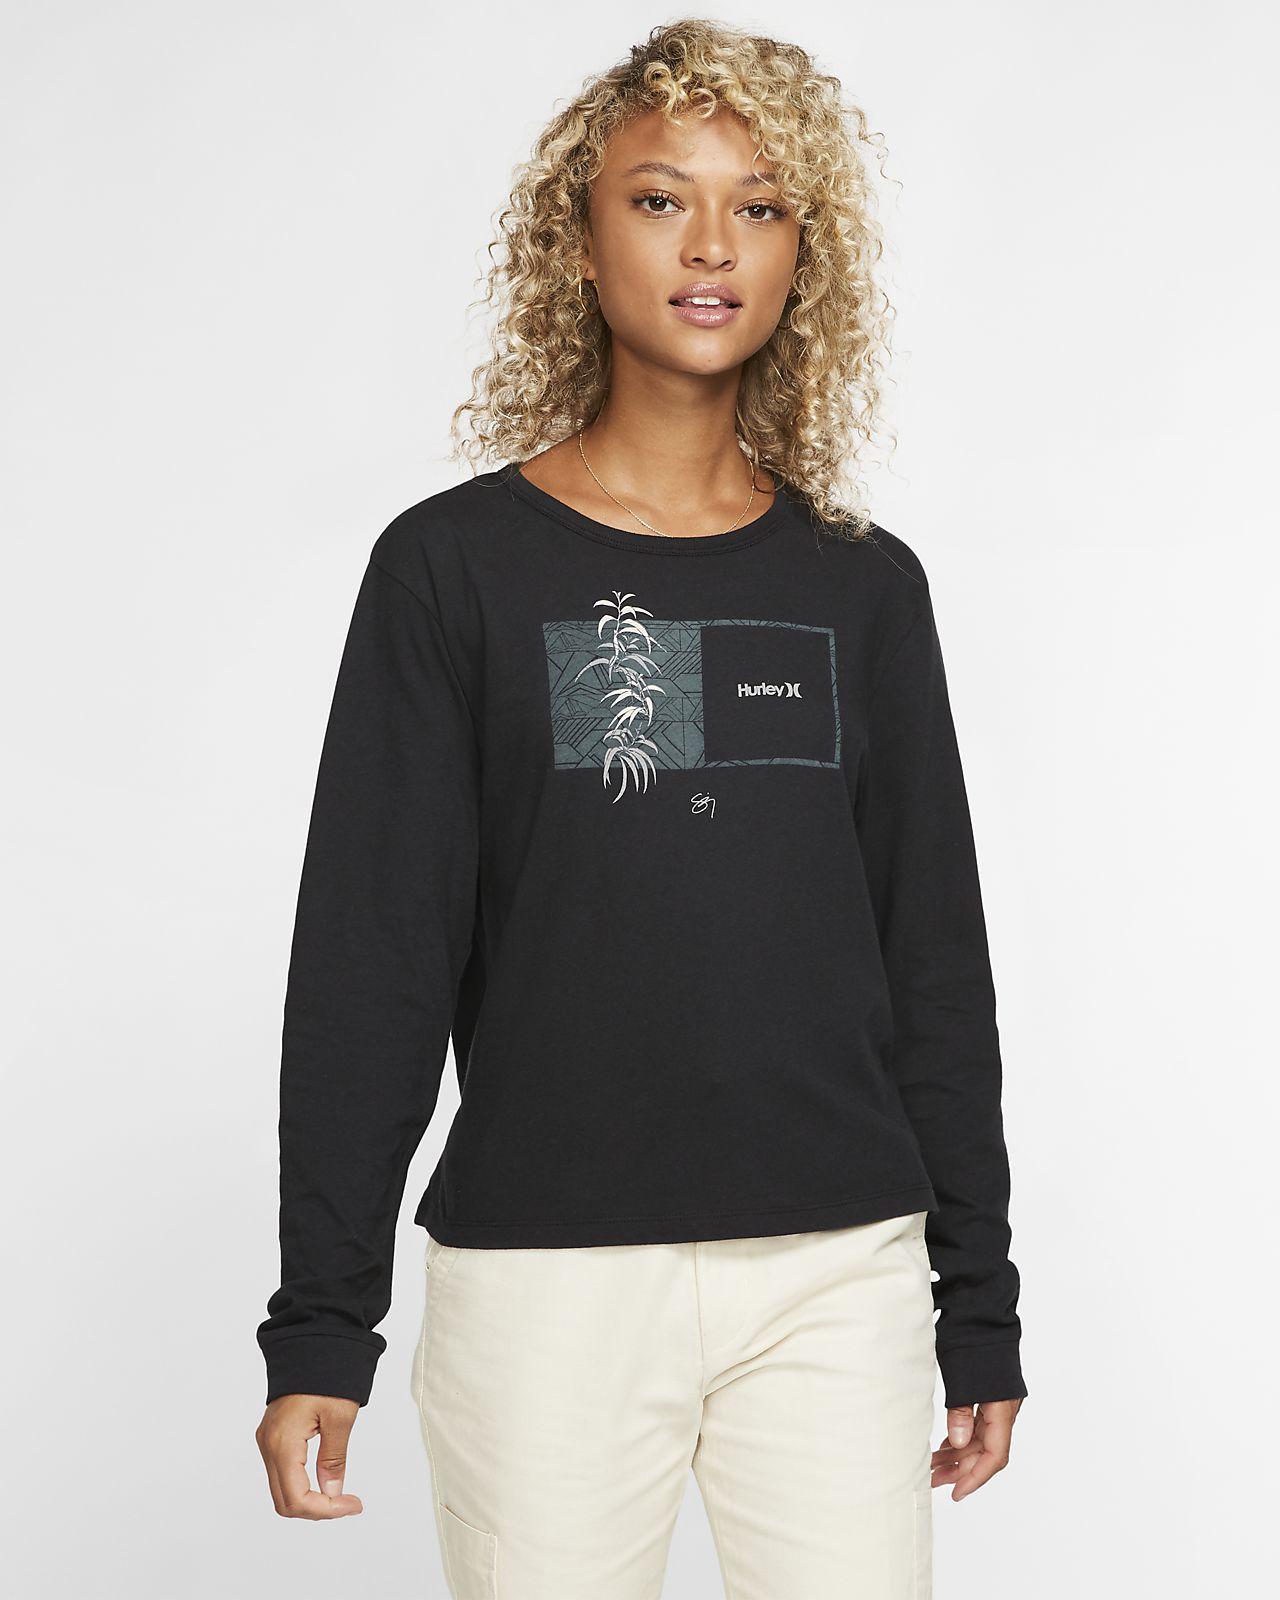 Hurley Sig Zane Perfect langermet T-skjorte til dame